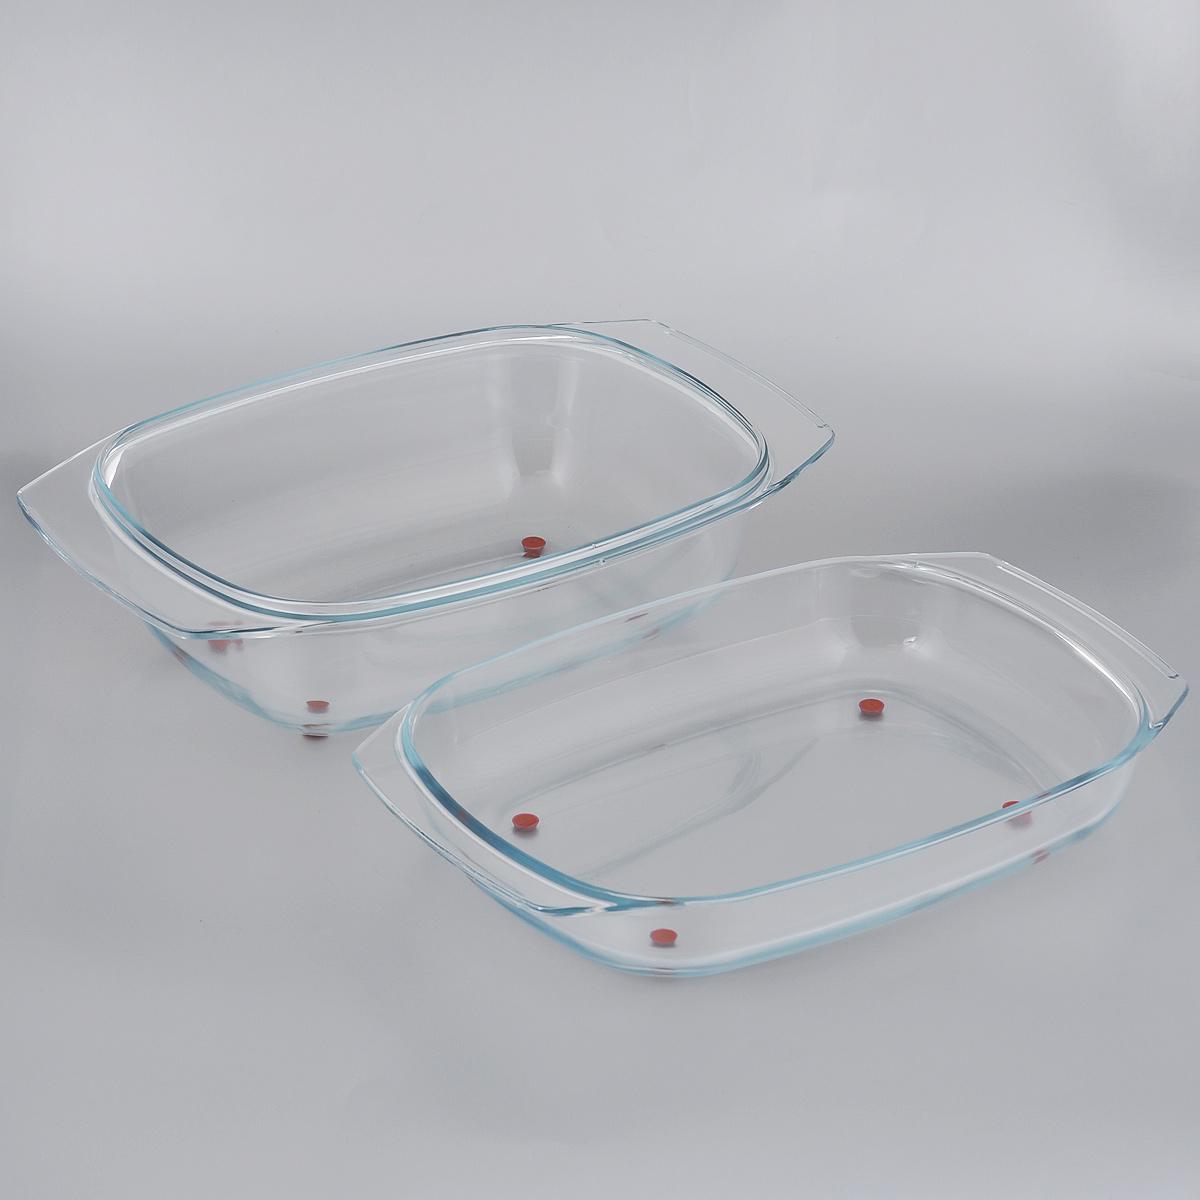 Жаровня Tescoma Delicia Glass с крышкой, 42 см х 26 см629082